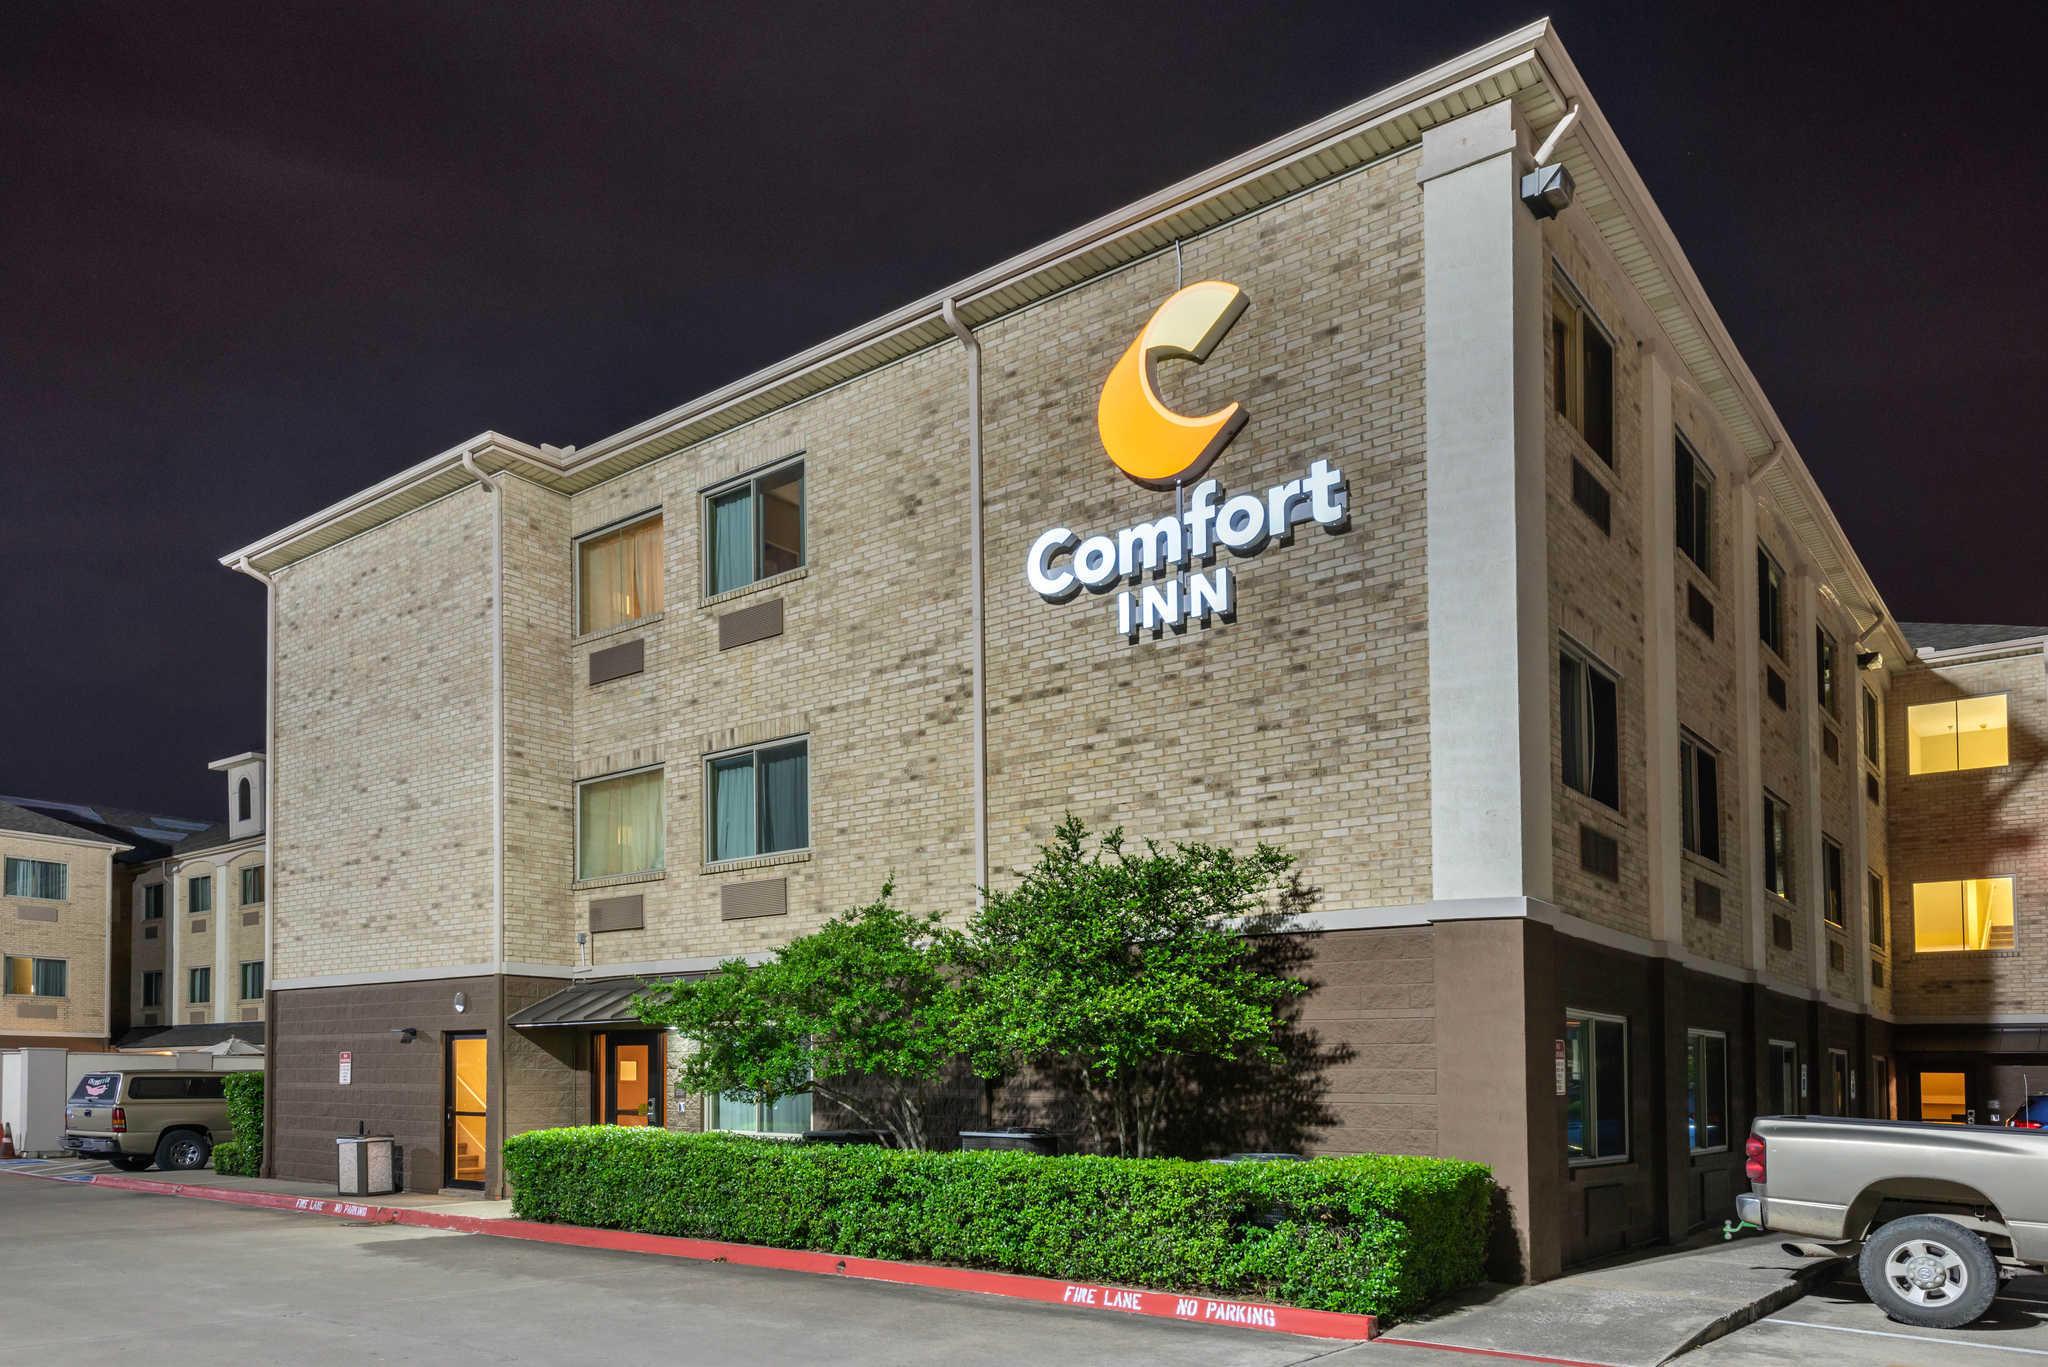 Comfort Inn DFW Airport North image 5